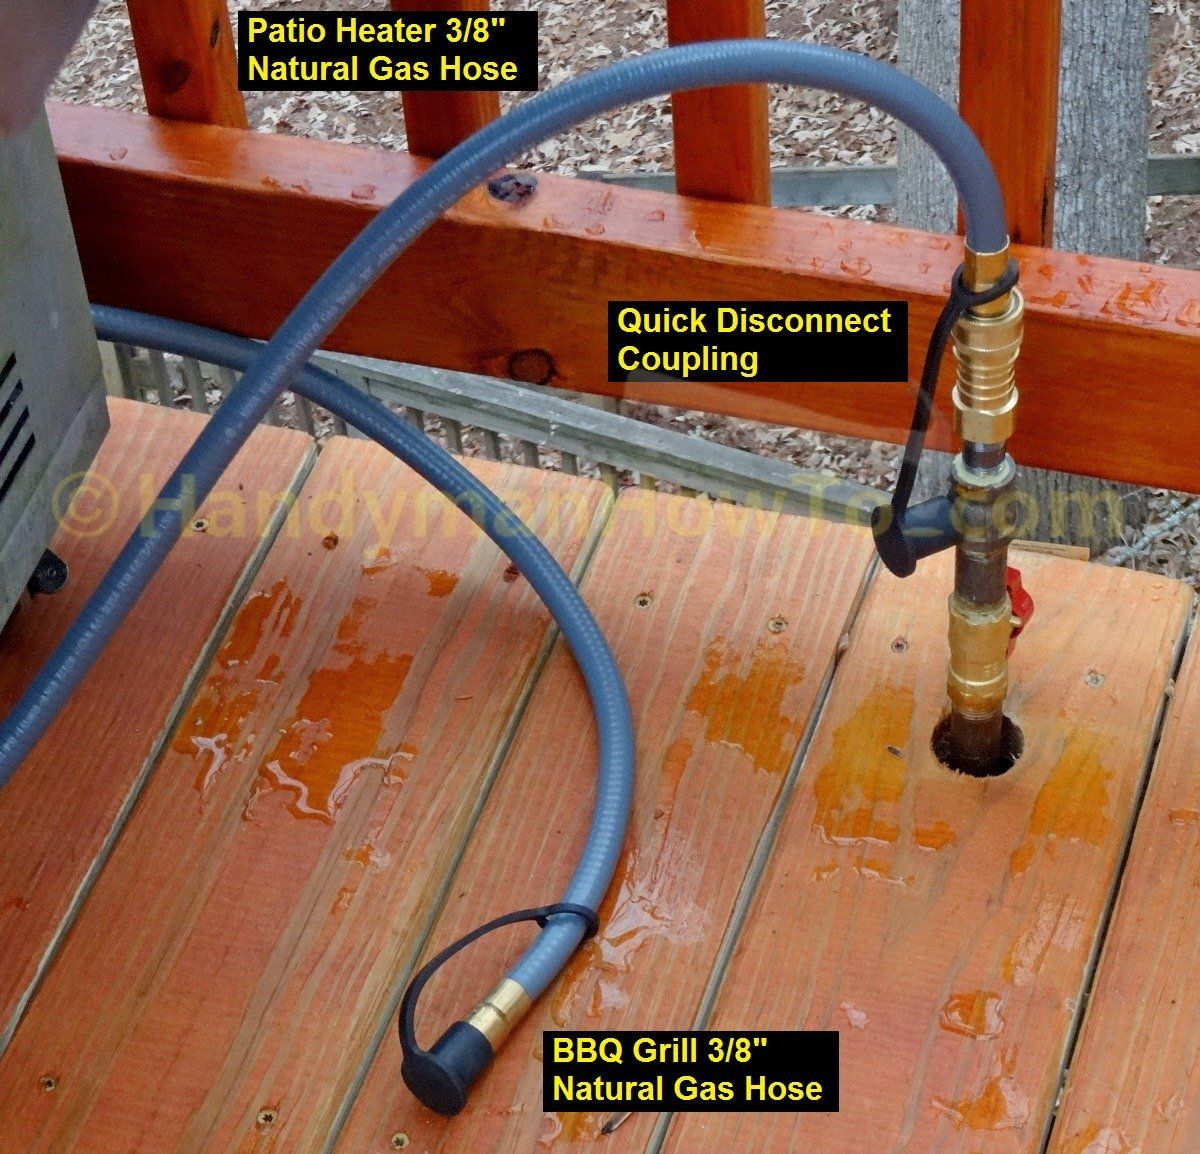 Natural Gas Grills Natural Gas Grill Natural Gas Patio Heater Gas Firepit